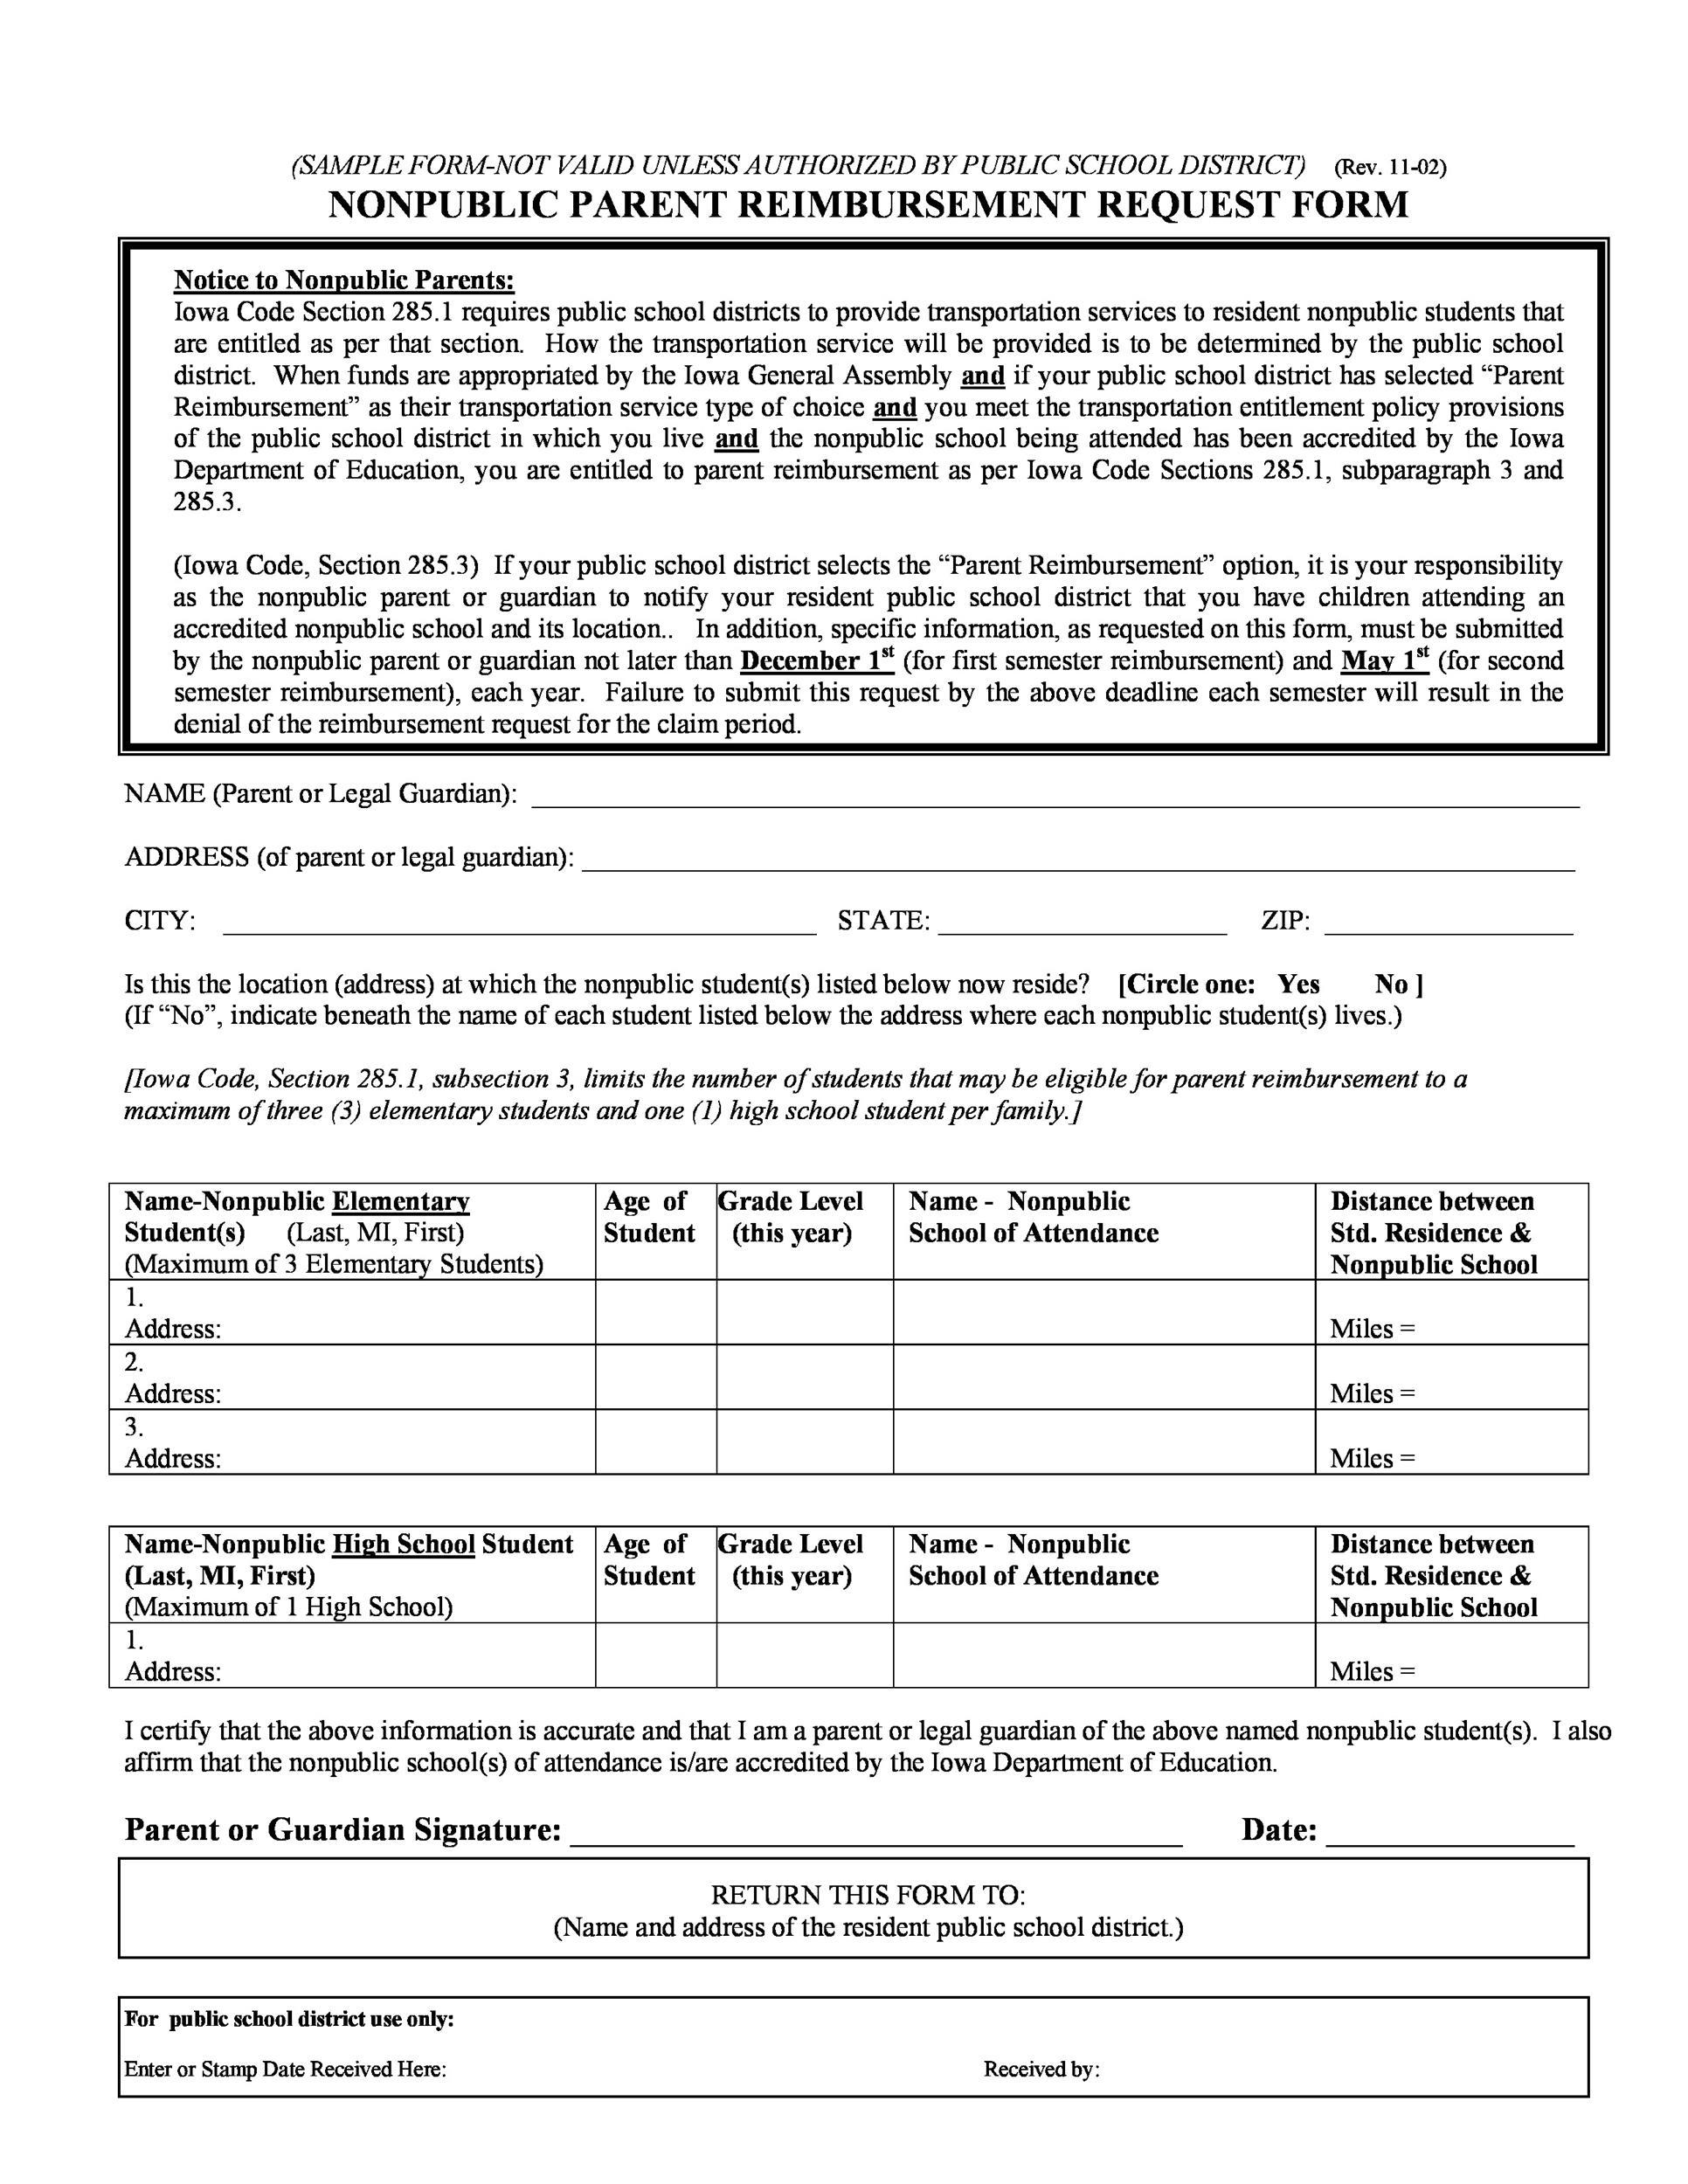 47 Reimbursement Form Templates Mileage, Expense, VSP